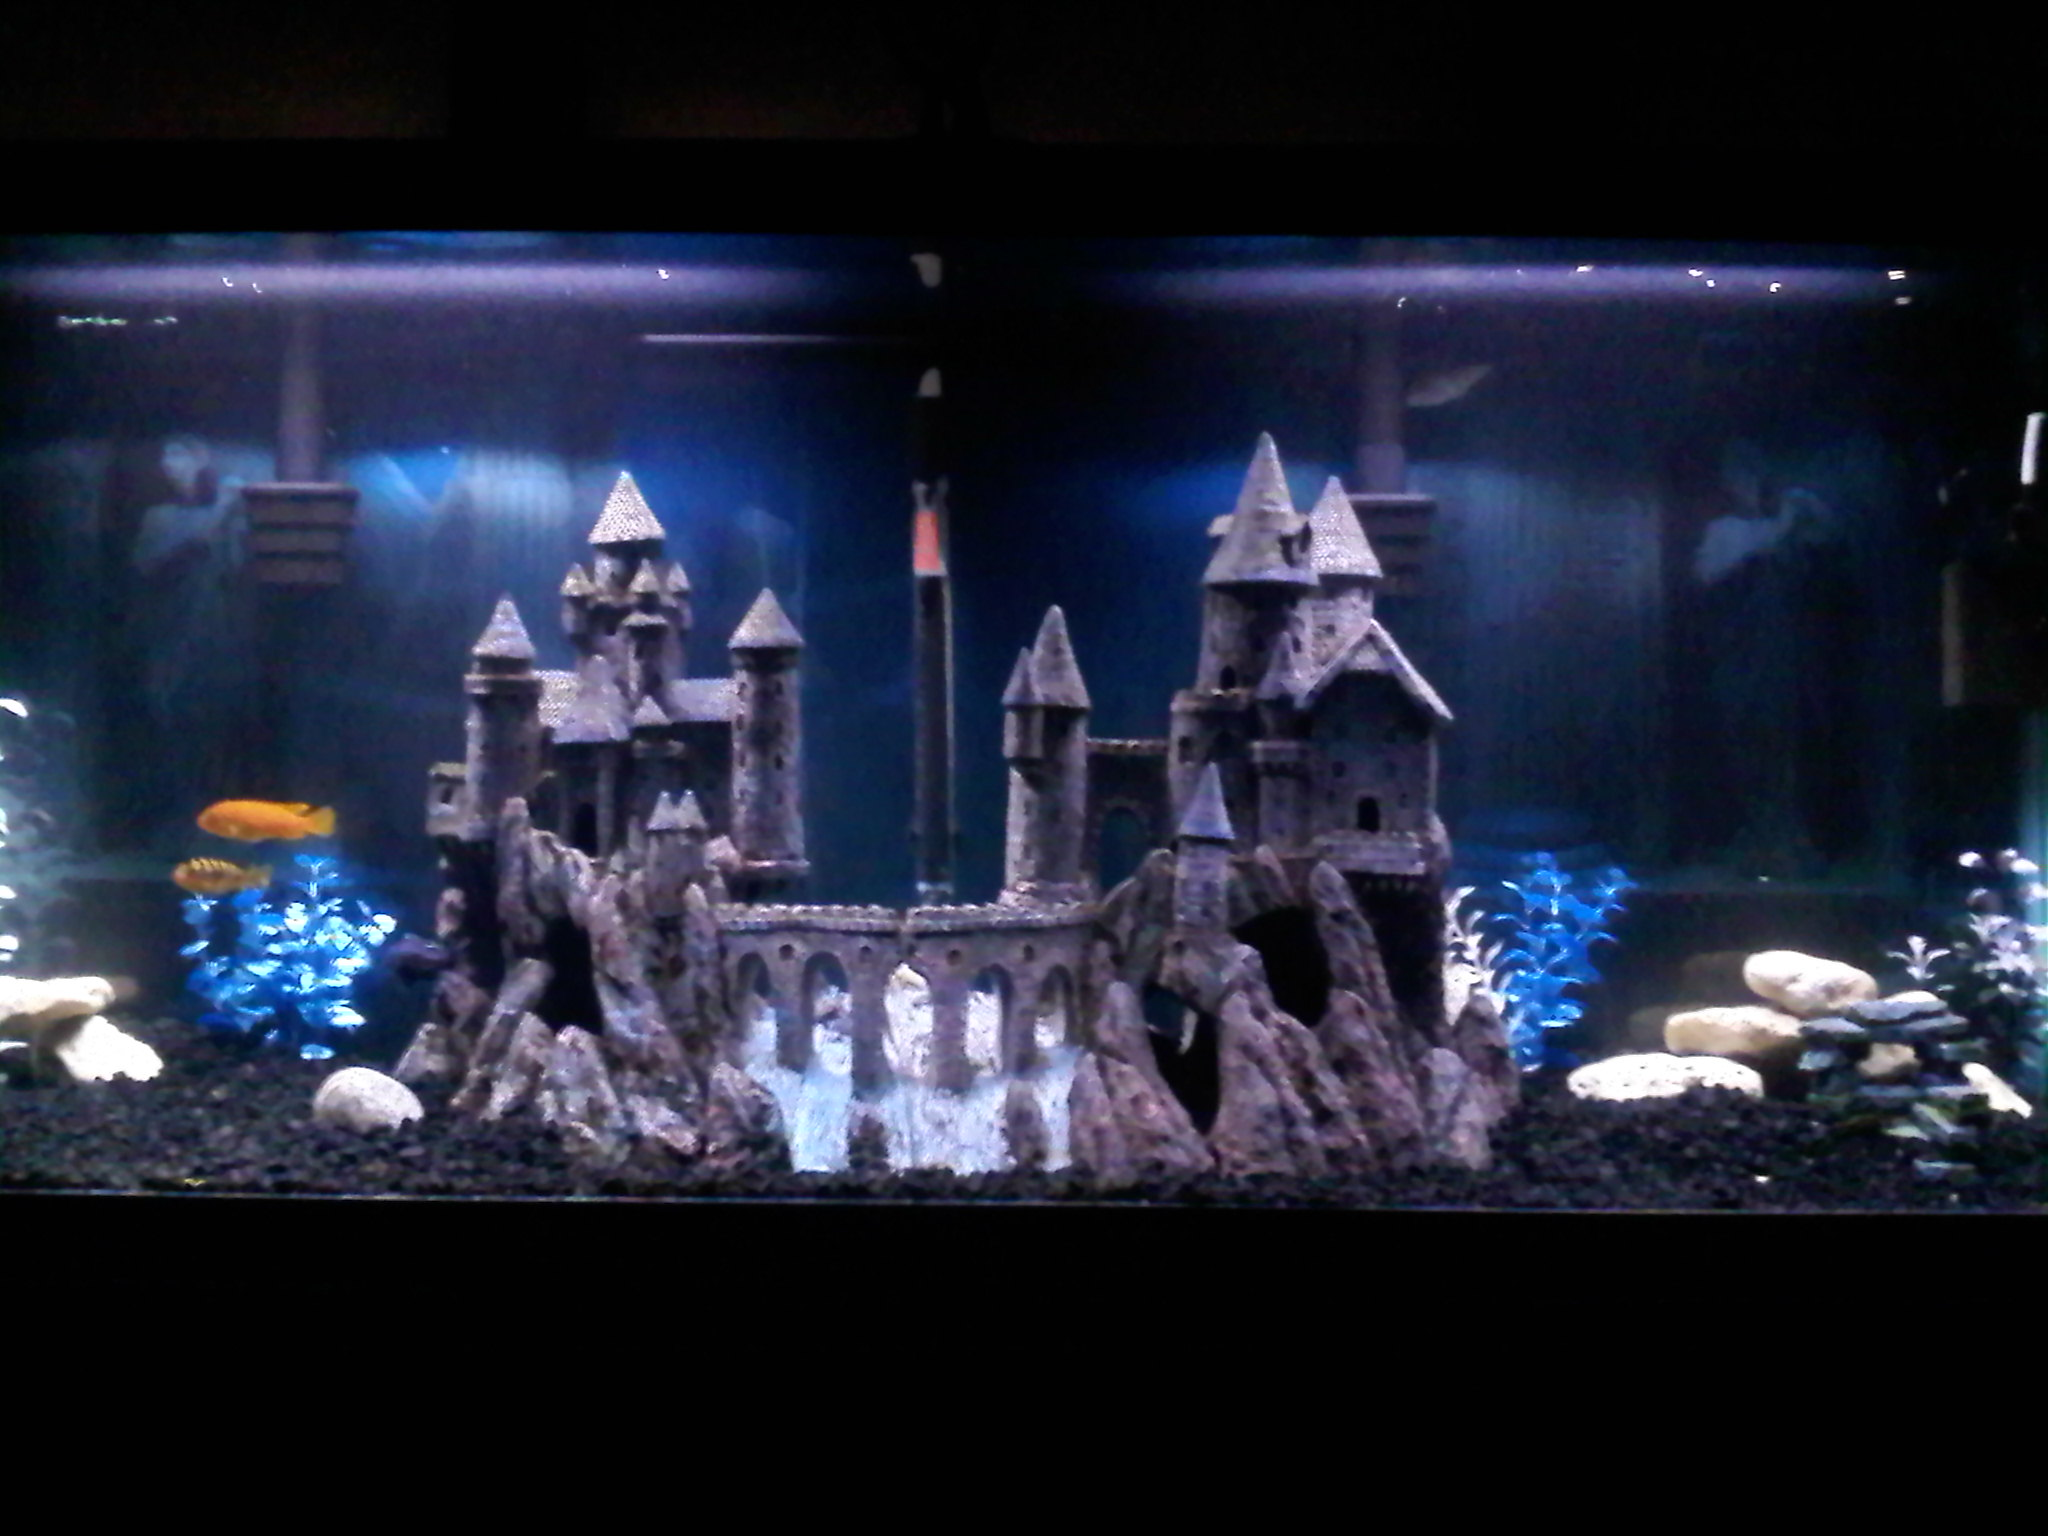 Aquarium Dragon Decorations